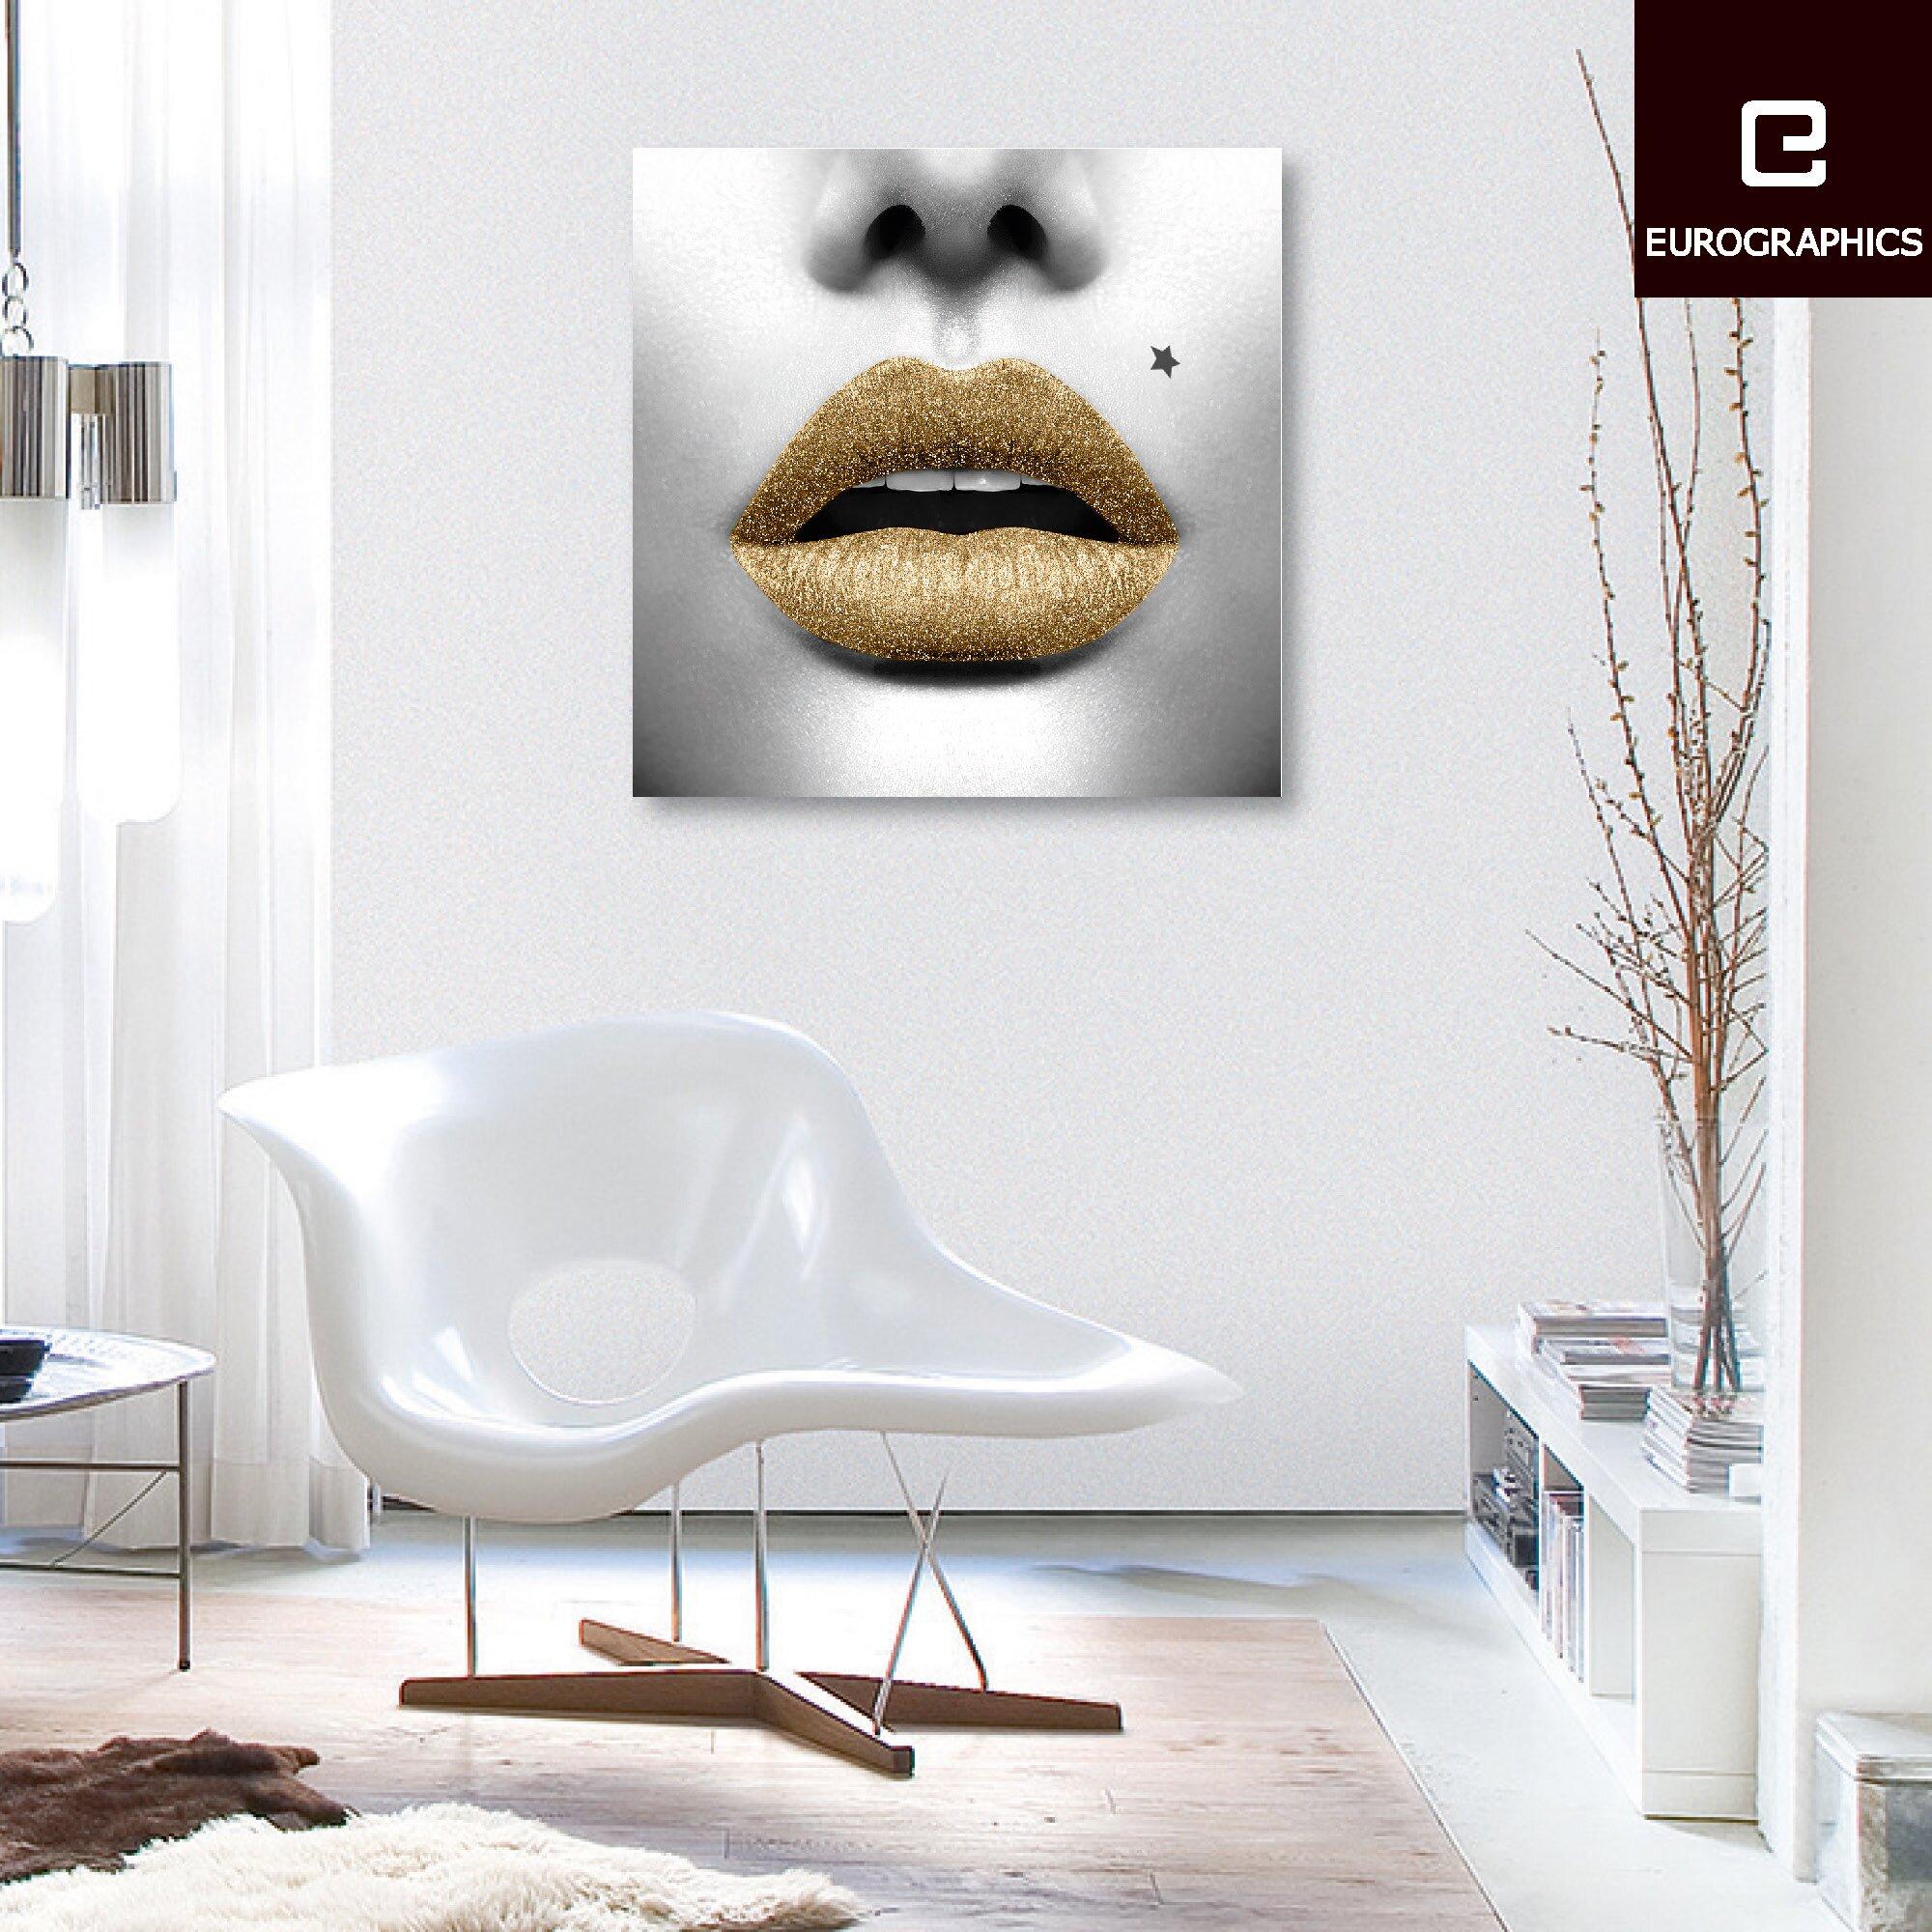 Eurographics Fashion Art Star Lips by Design Studio Wall